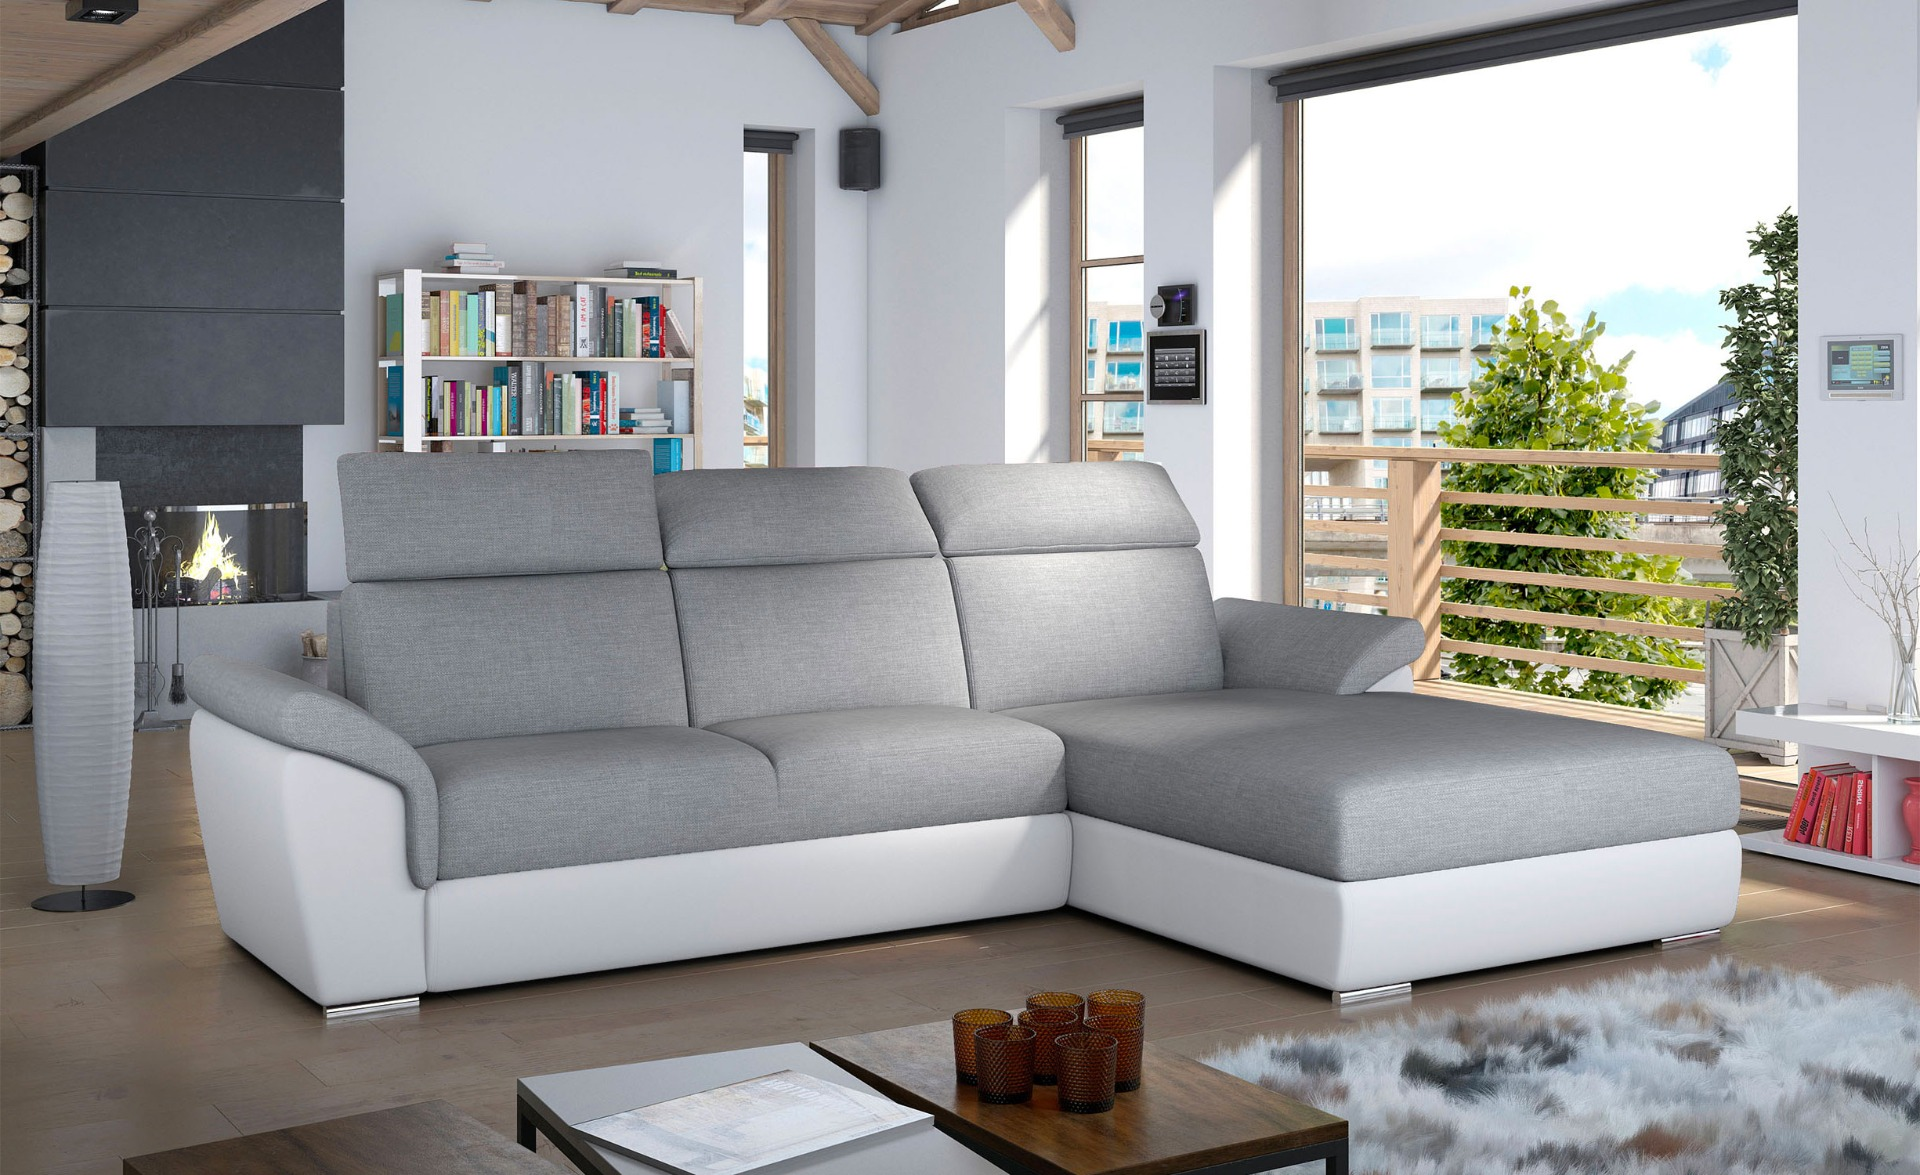 Converteerbare hoekbank Trevisco grijze stof en witte faux